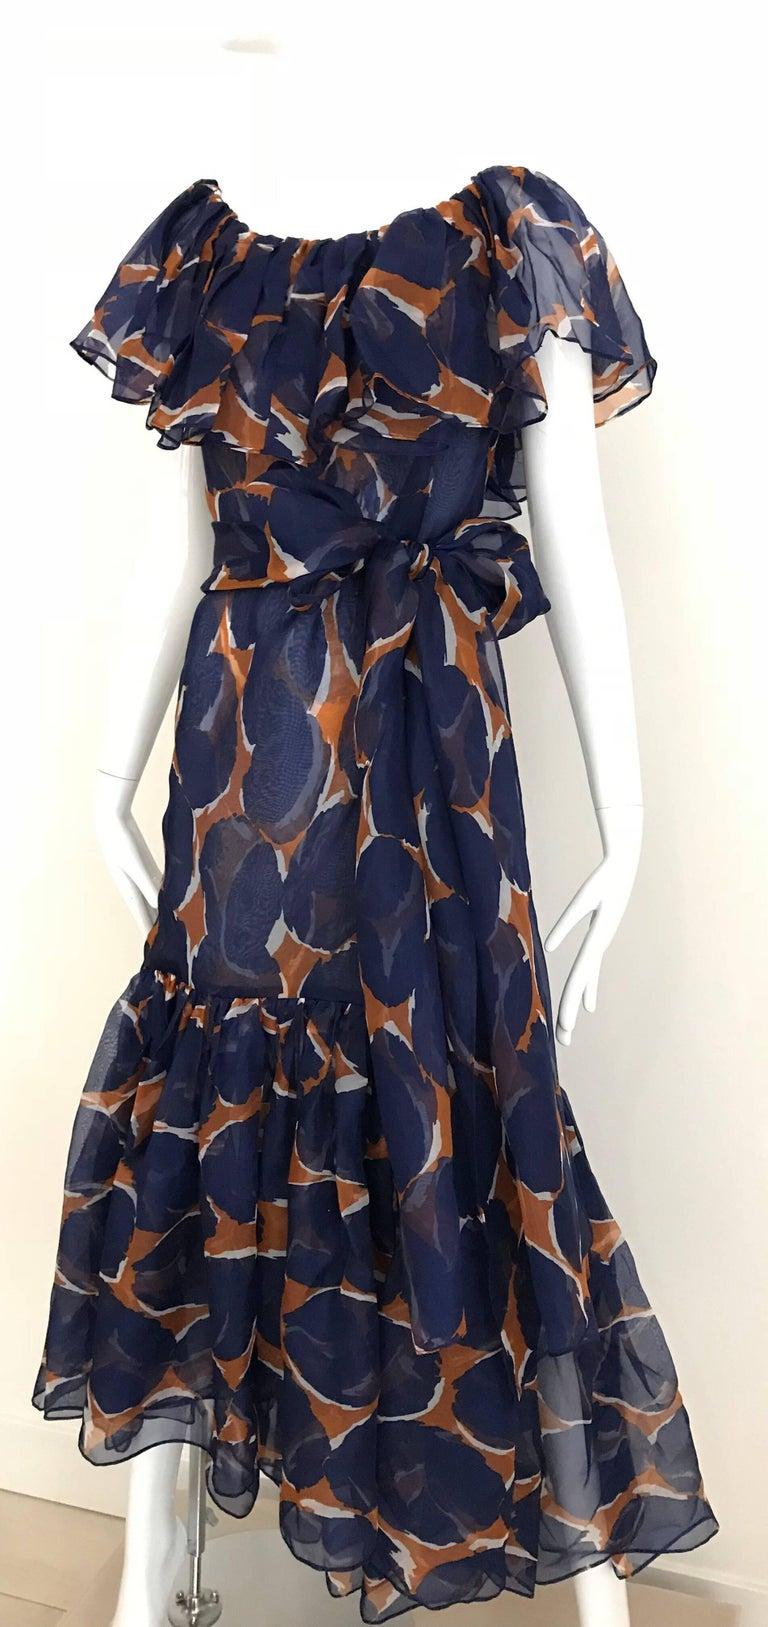 Vintage Yves Saint Laurent Blue and Brown Print Flamenco Style Silk Dress 8